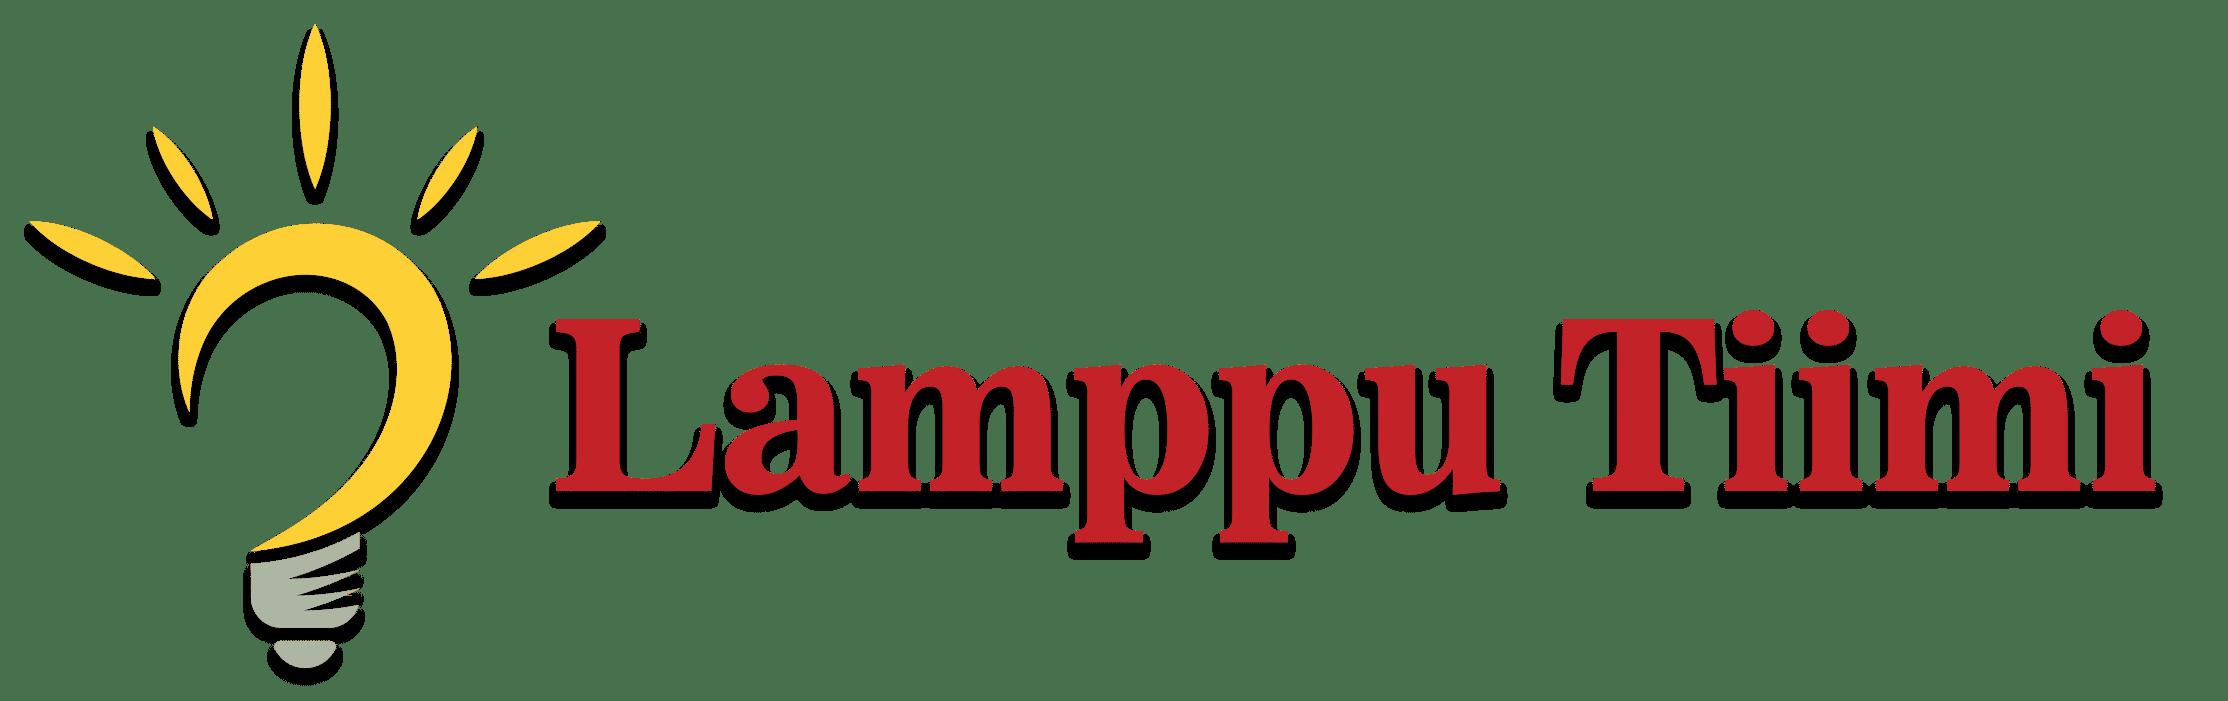 Oulun Lamppu Tiimi Oy